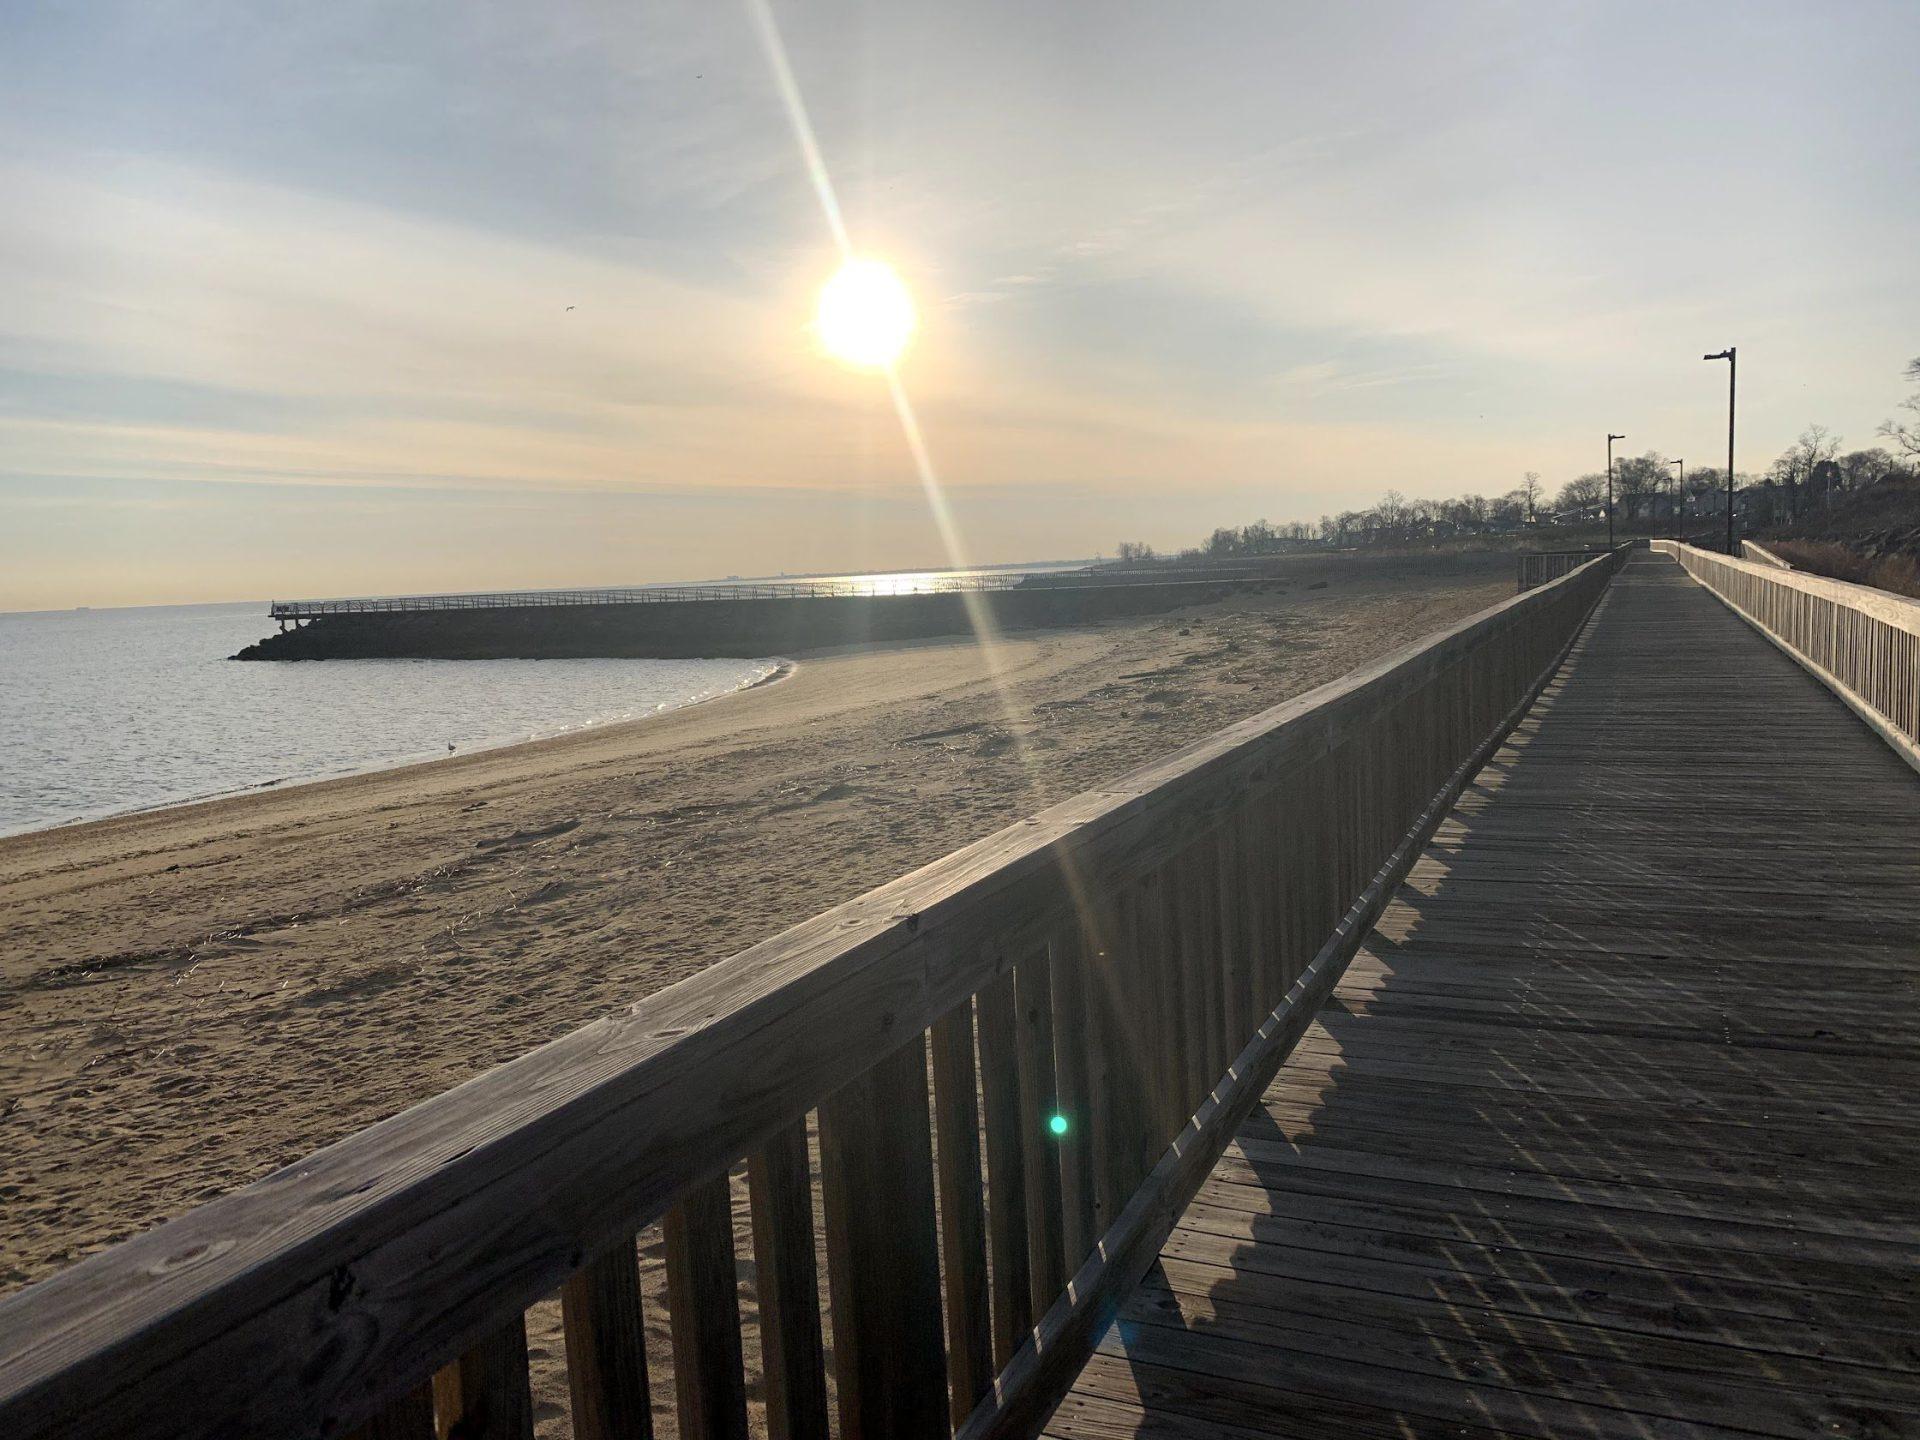 Laurence Harbor views